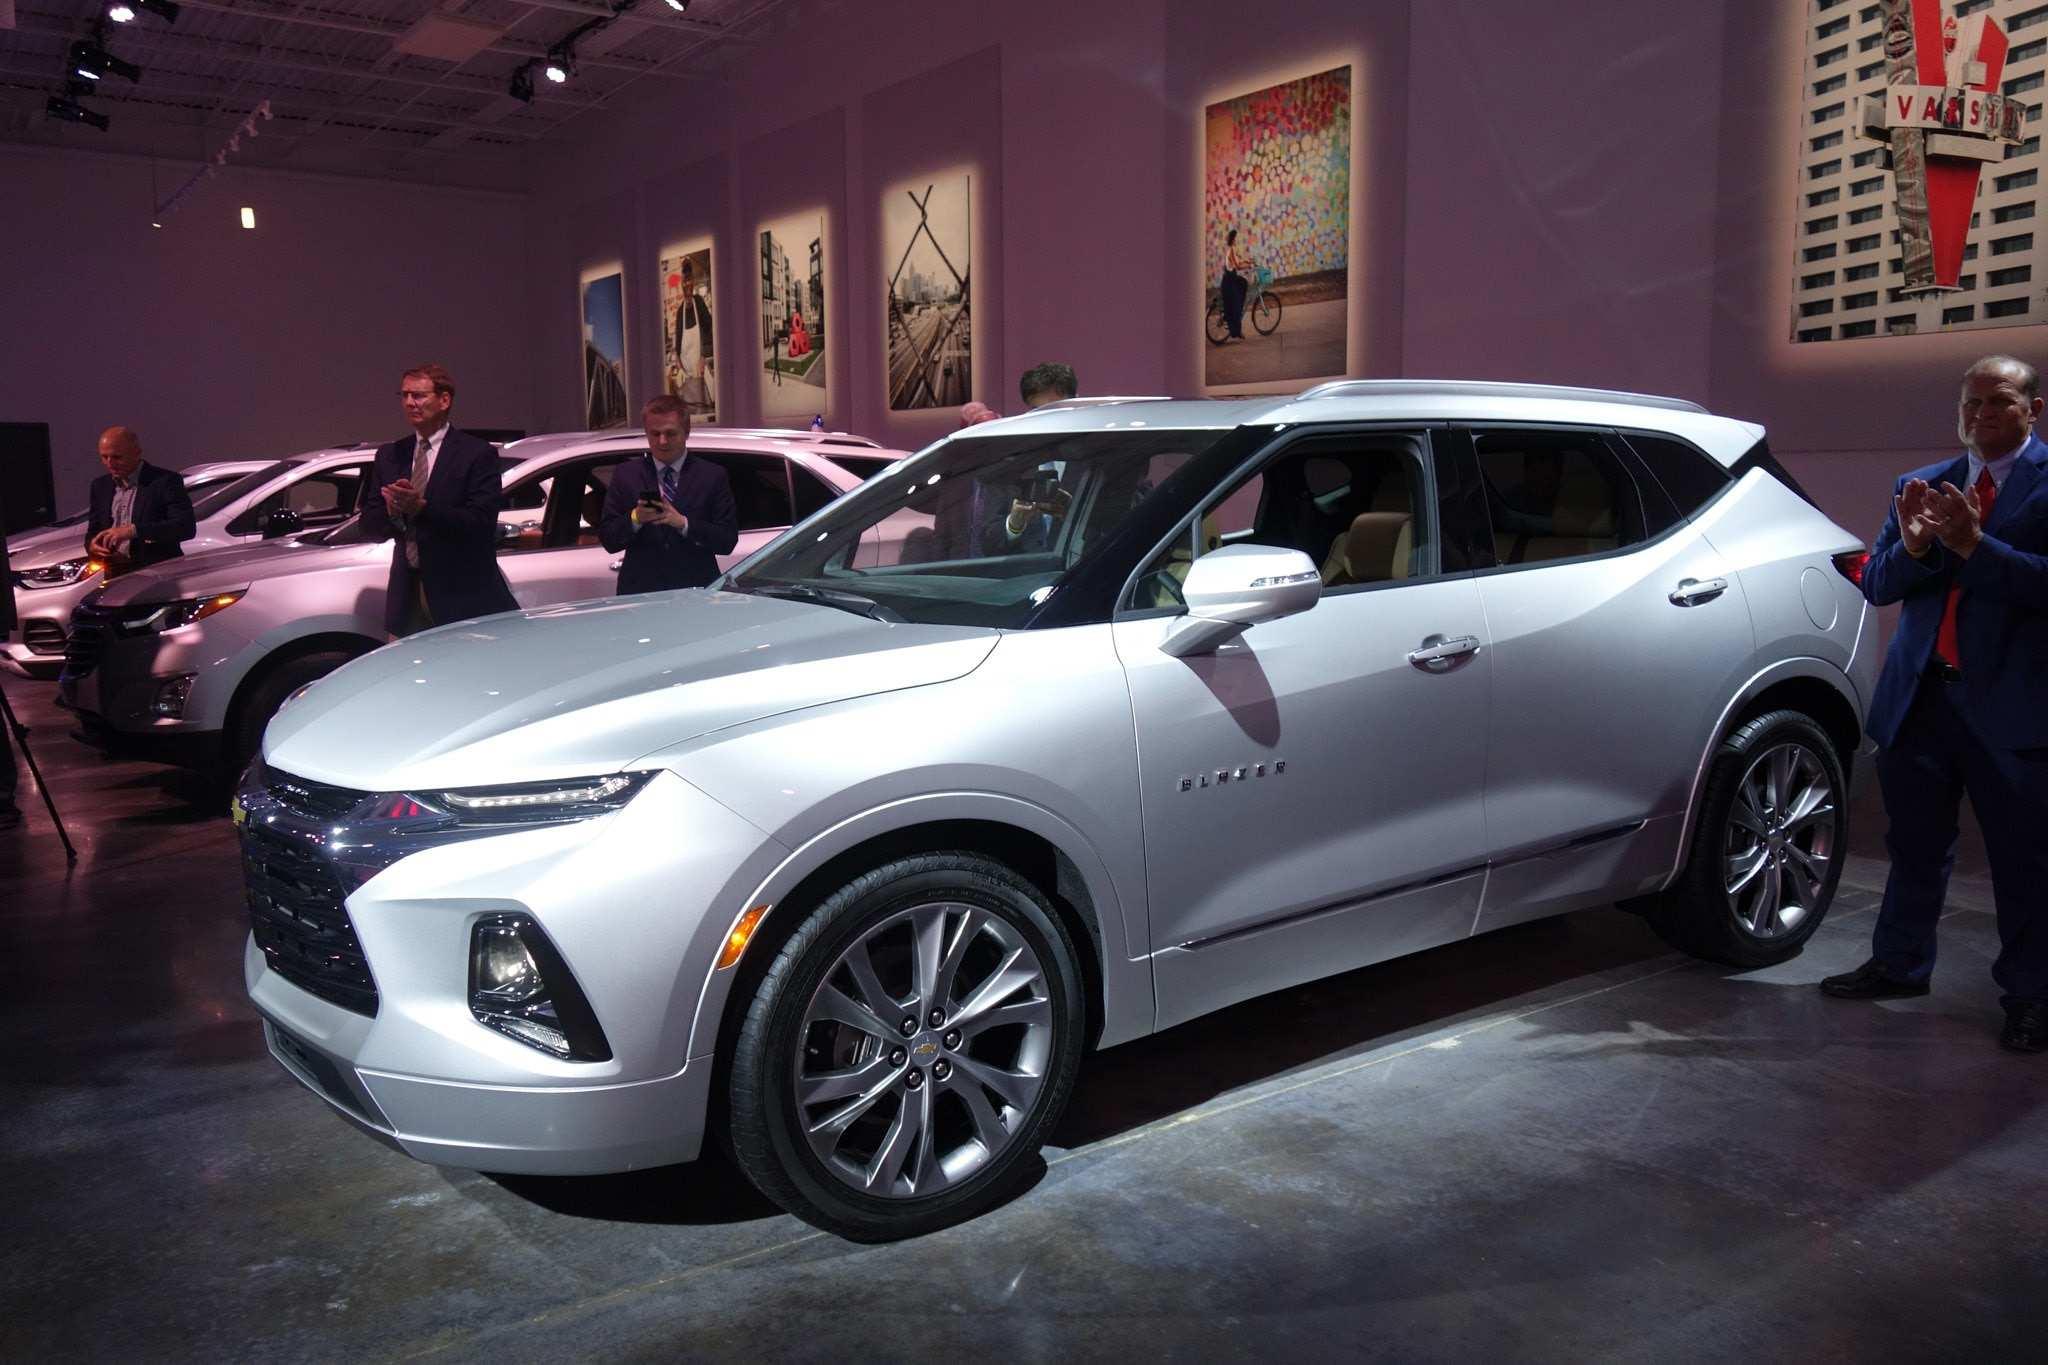 85 All New New New Chevrolet 2019 Blazer Engine Release Date with New New Chevrolet 2019 Blazer Engine